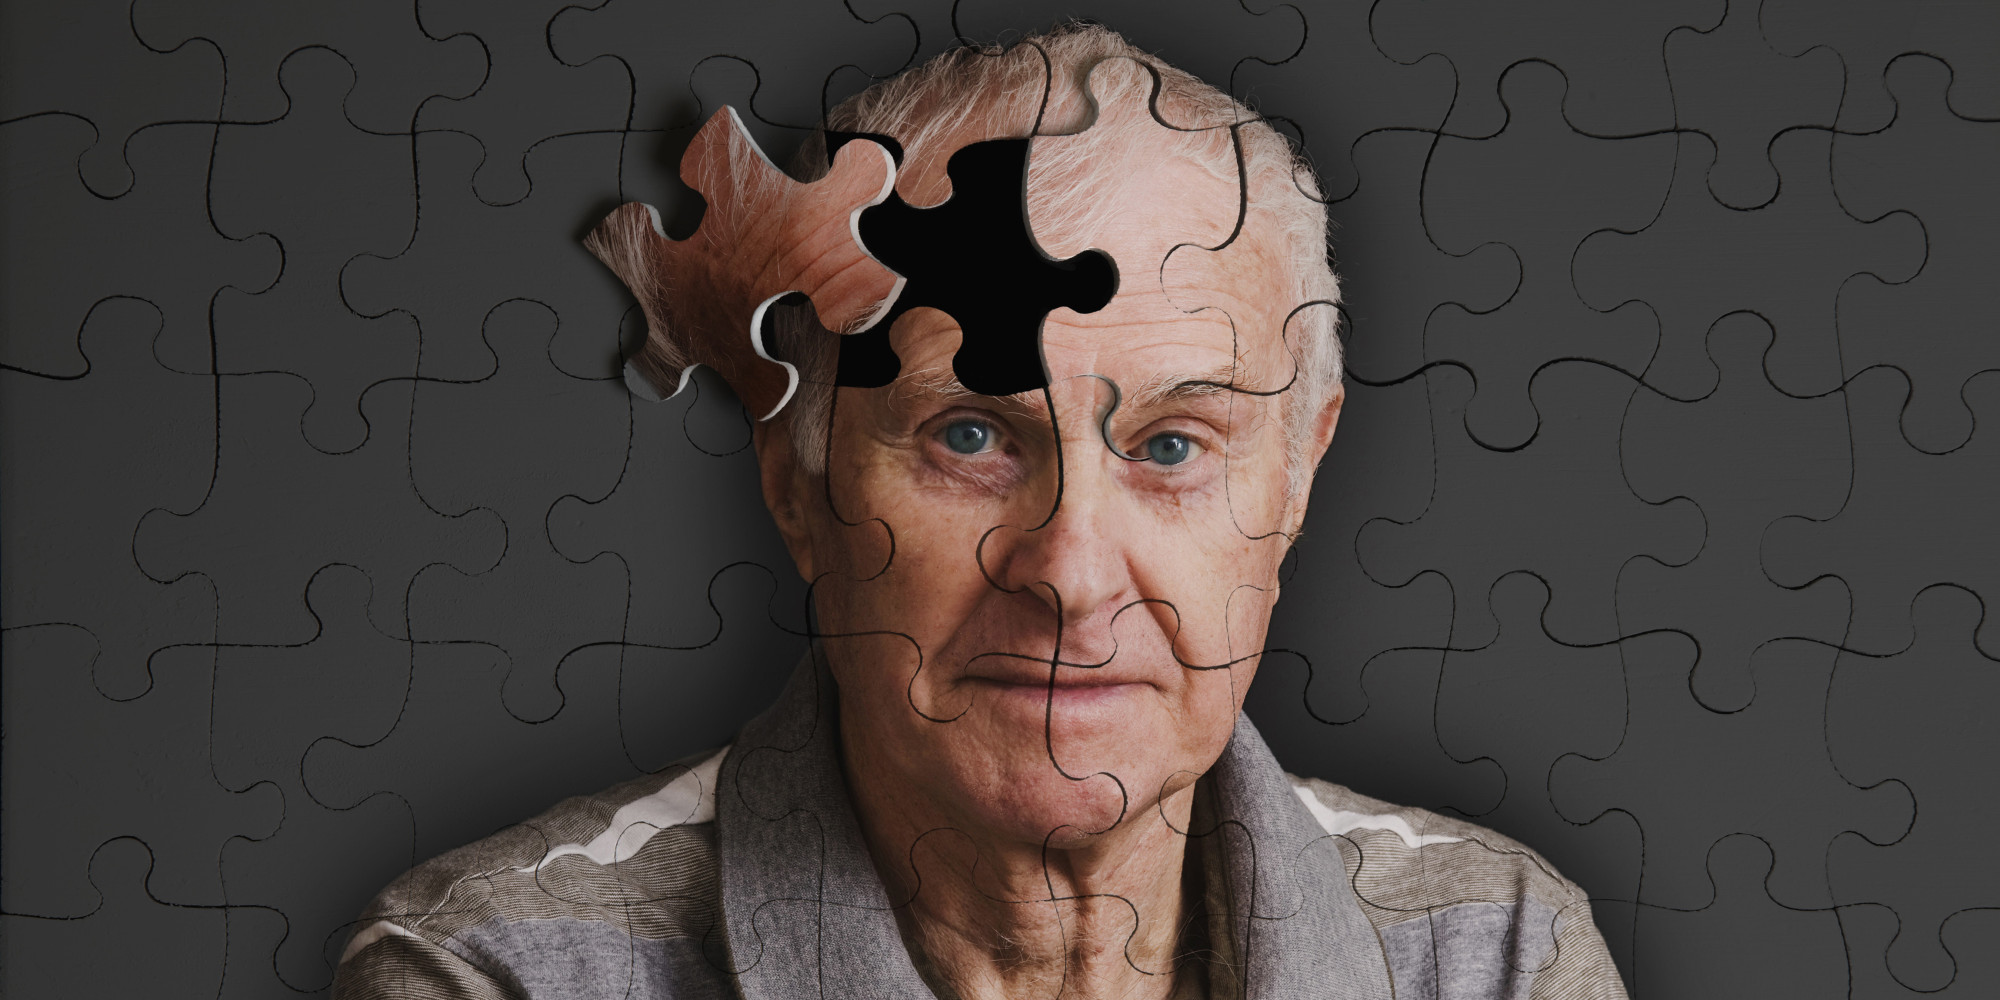 اسباب فقدان الذاكرة وطرق العلاج منها O-MEMORY-LOSS-facebook